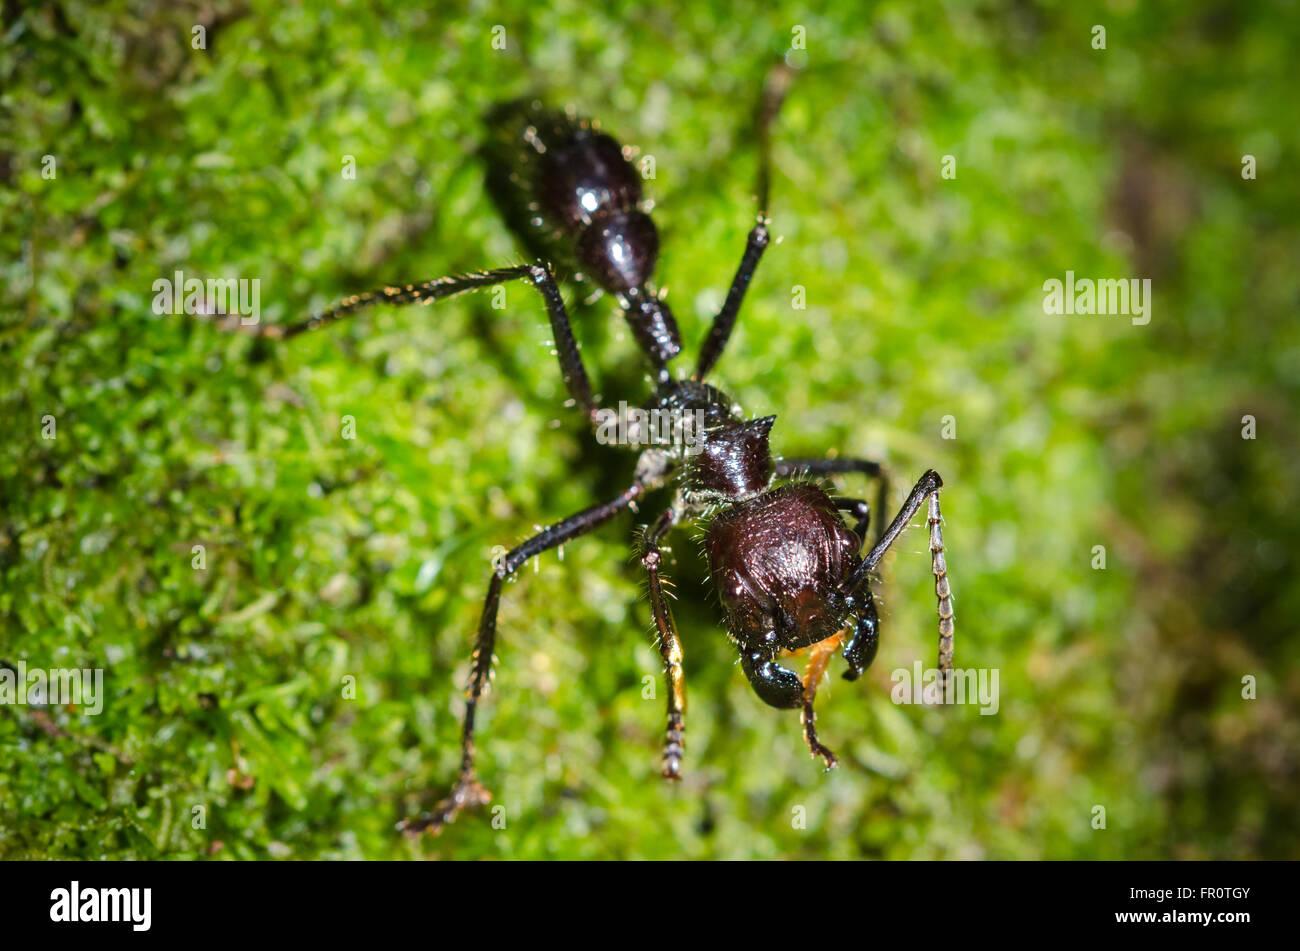 Bullet Ant (Paraponera clavata), Rara Avis, Costa Rica Stock Photo